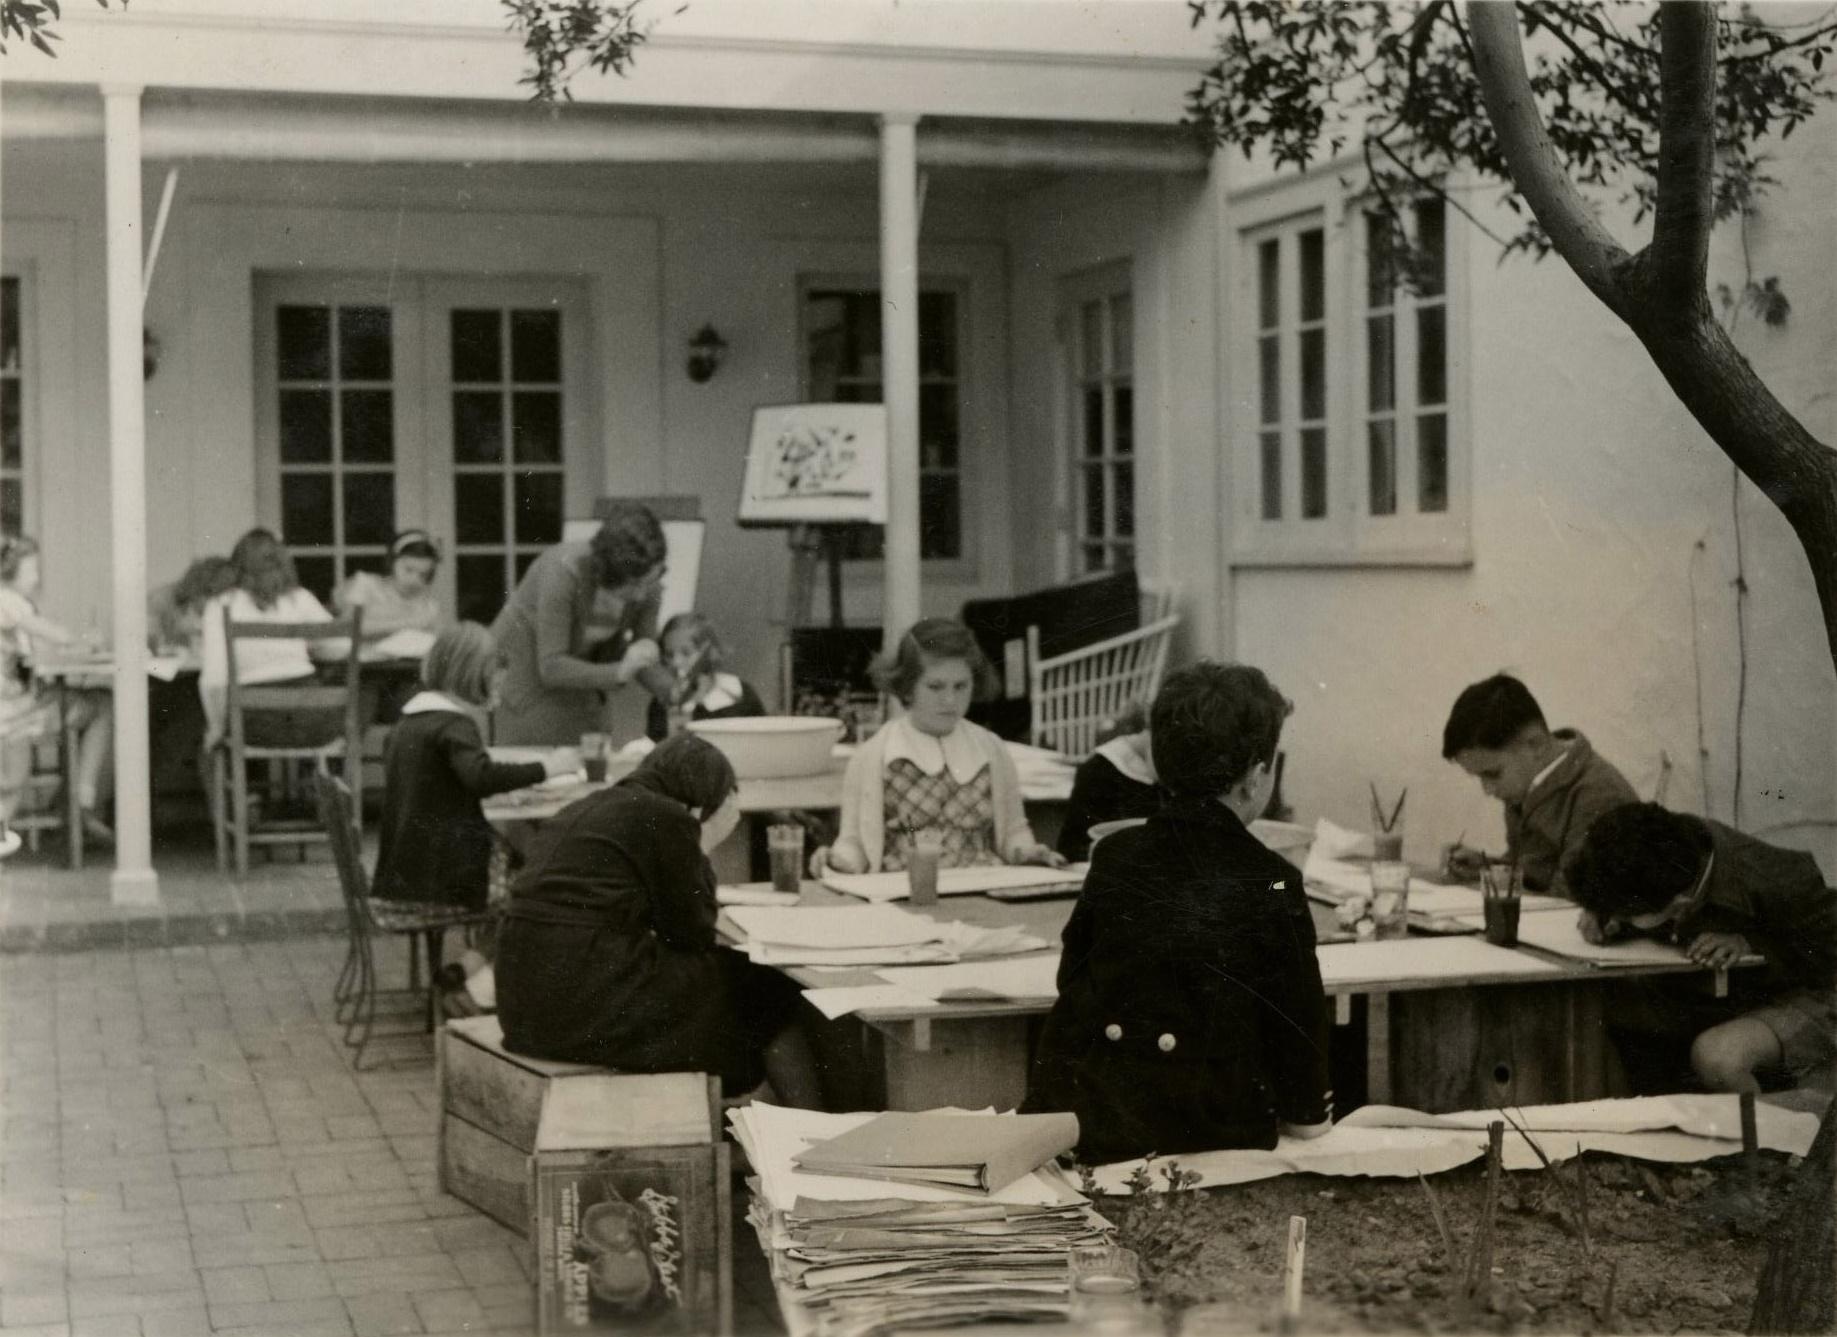 Galka Emmy Scheyer mit Kindern, circa 1940, Foto: Lette Valeska, Copyright of Julia Hammid and the Estate of Tino Hammid